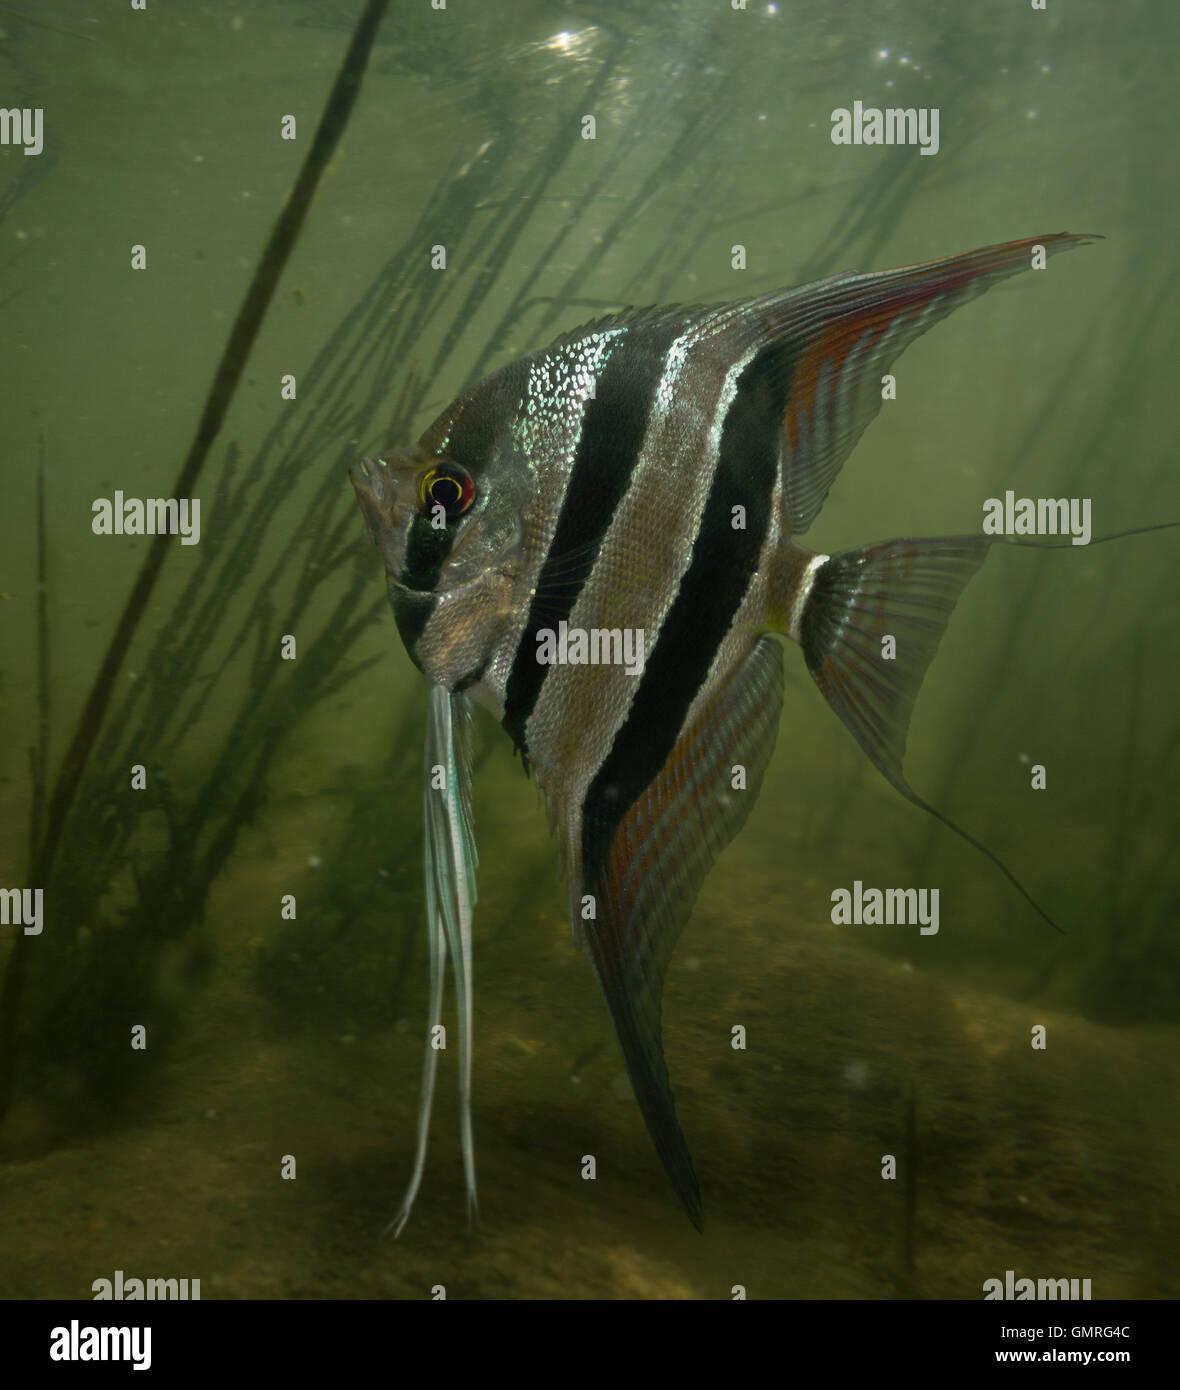 Altum Angelfish, Pterophyllum Altum Stock Photo, Royalty